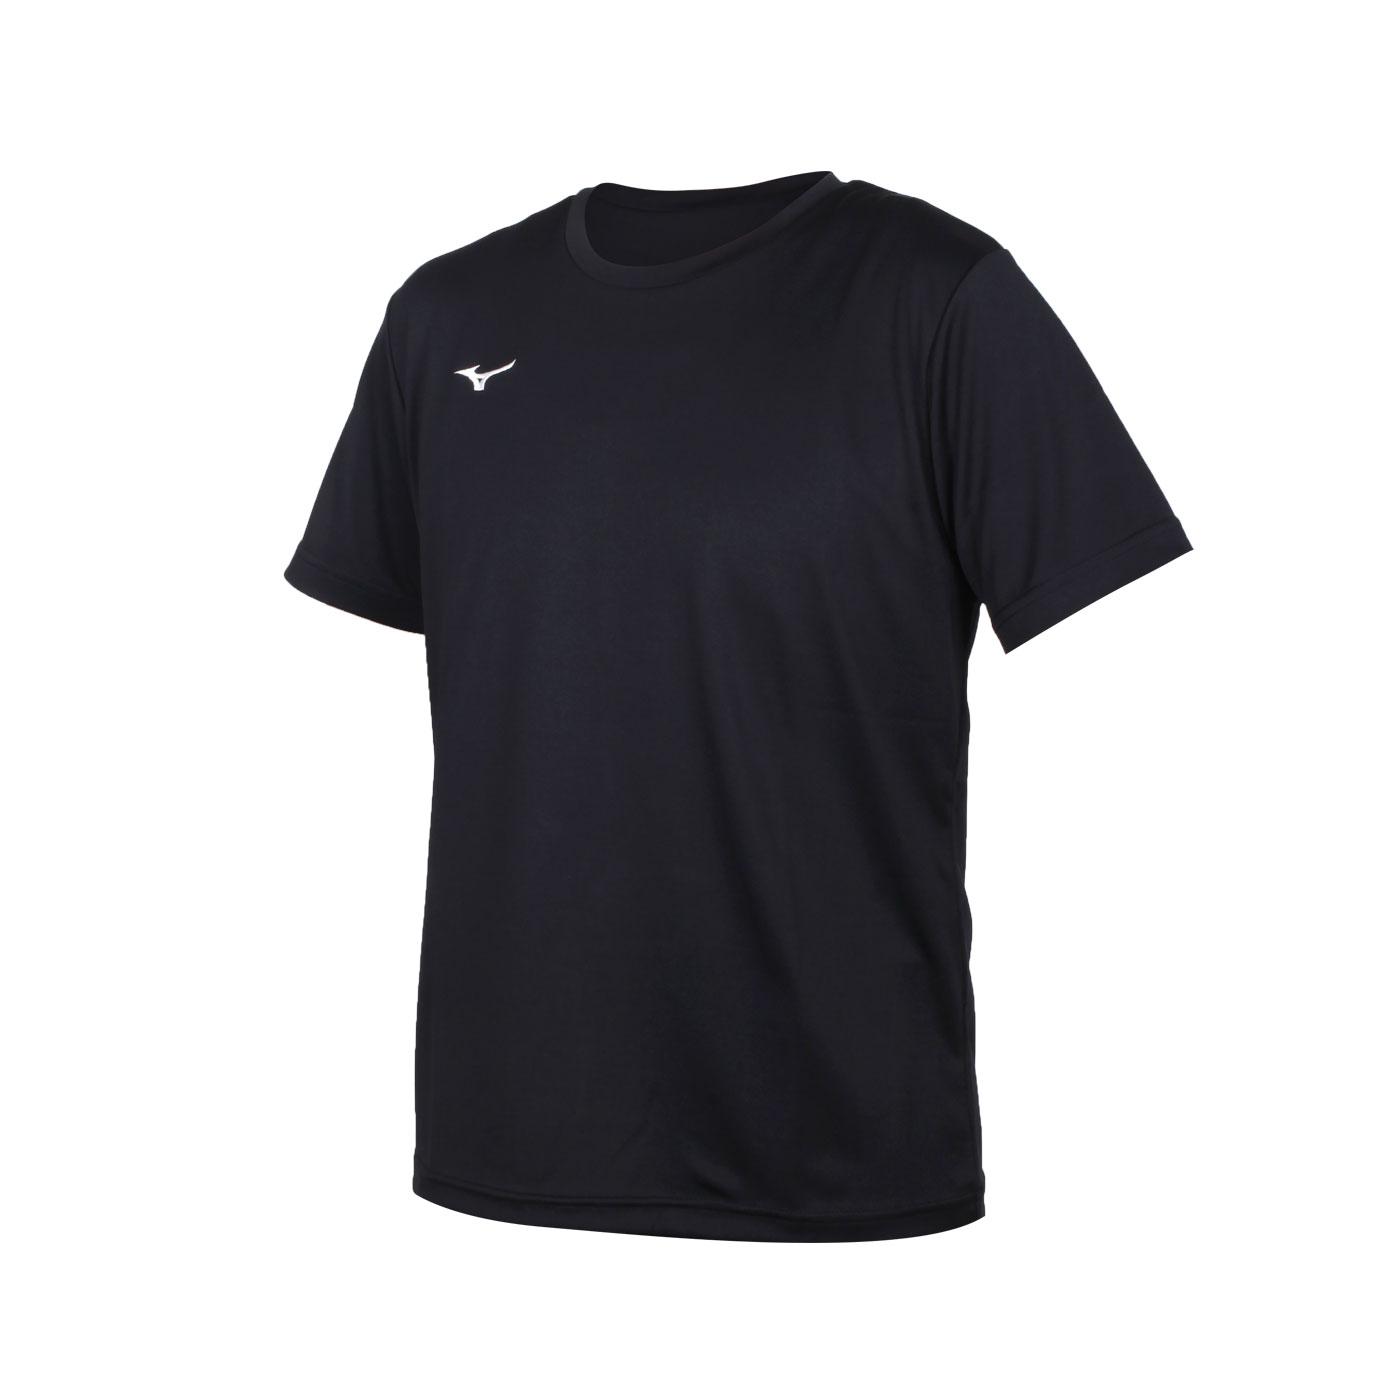 MIZUNO 男款短袖T恤 32TA150709 - 黑白